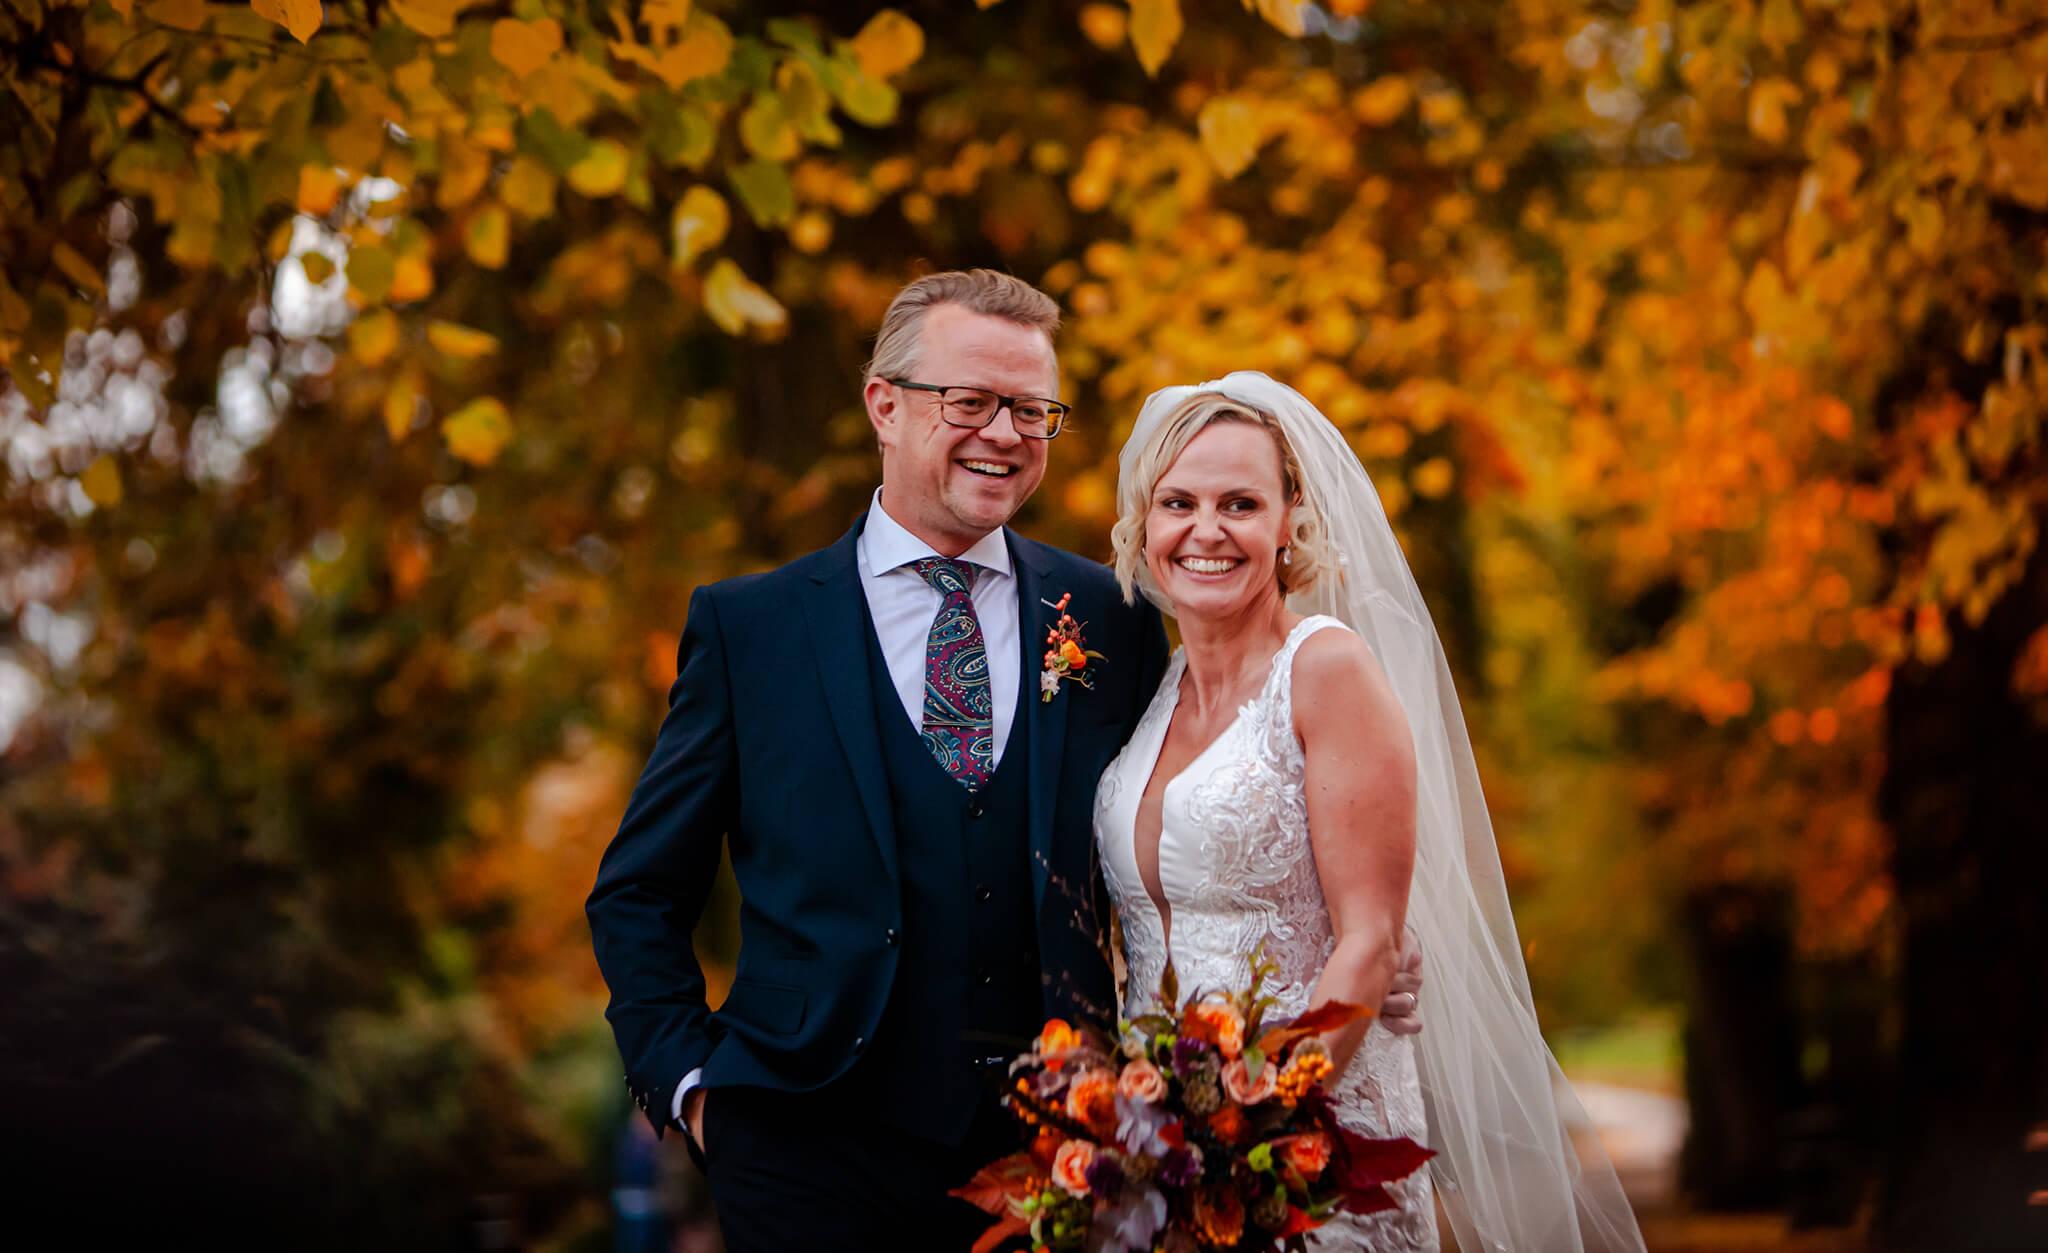 st-johns-litchfield-wedding-photography-stanbury-photography